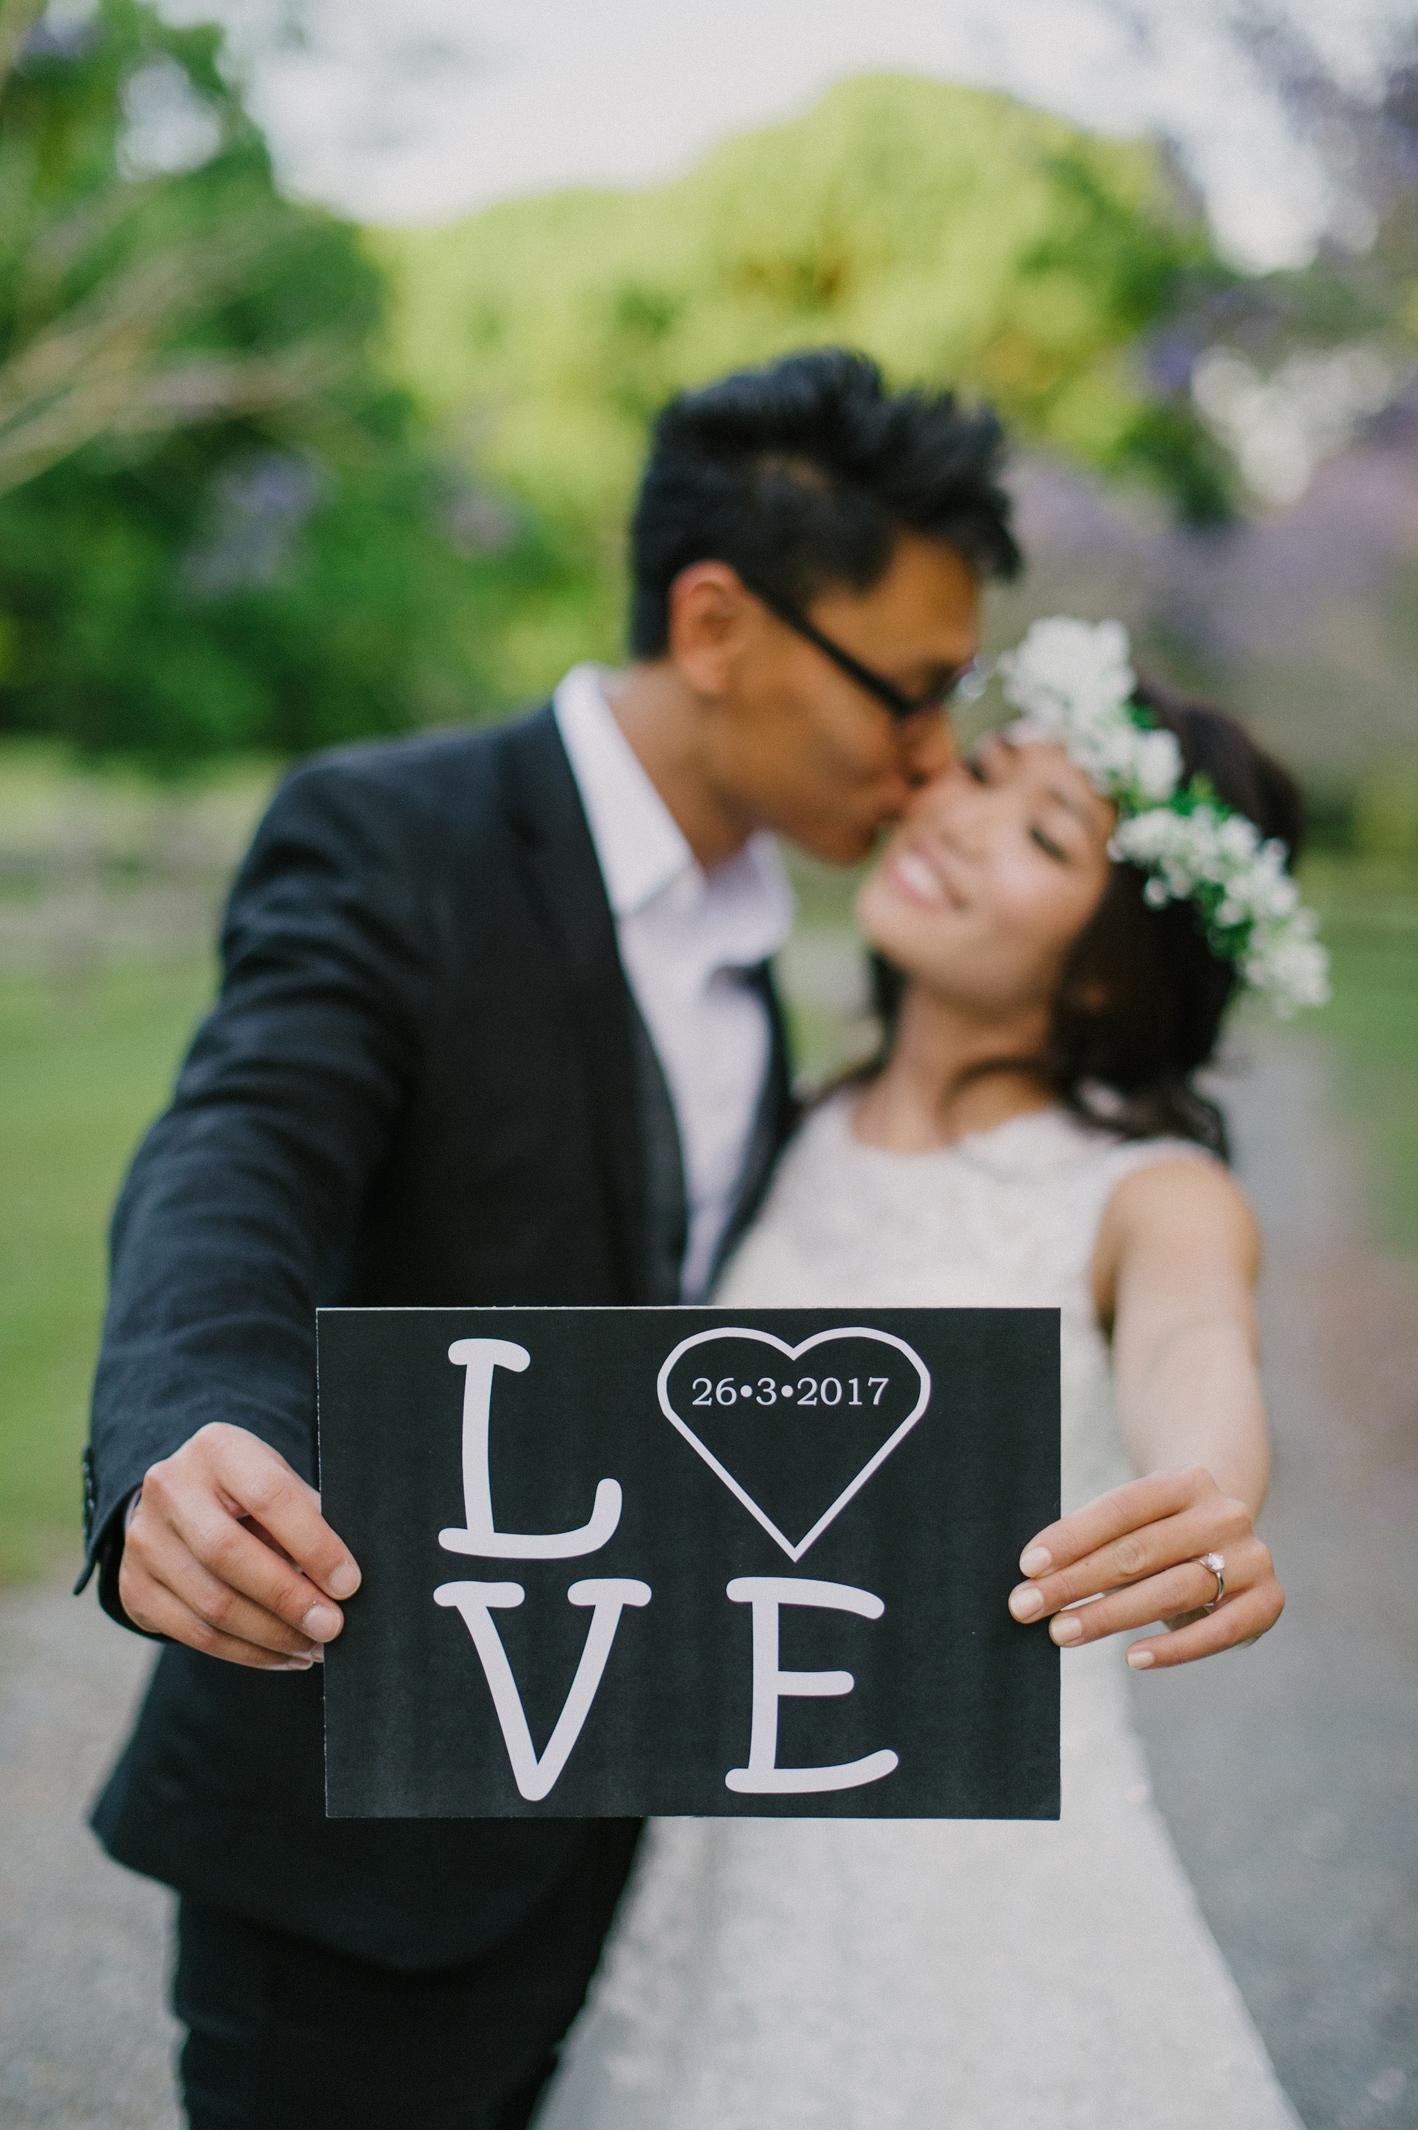 015-ed-janet-currumbin-wedding_sophie-baker-photography